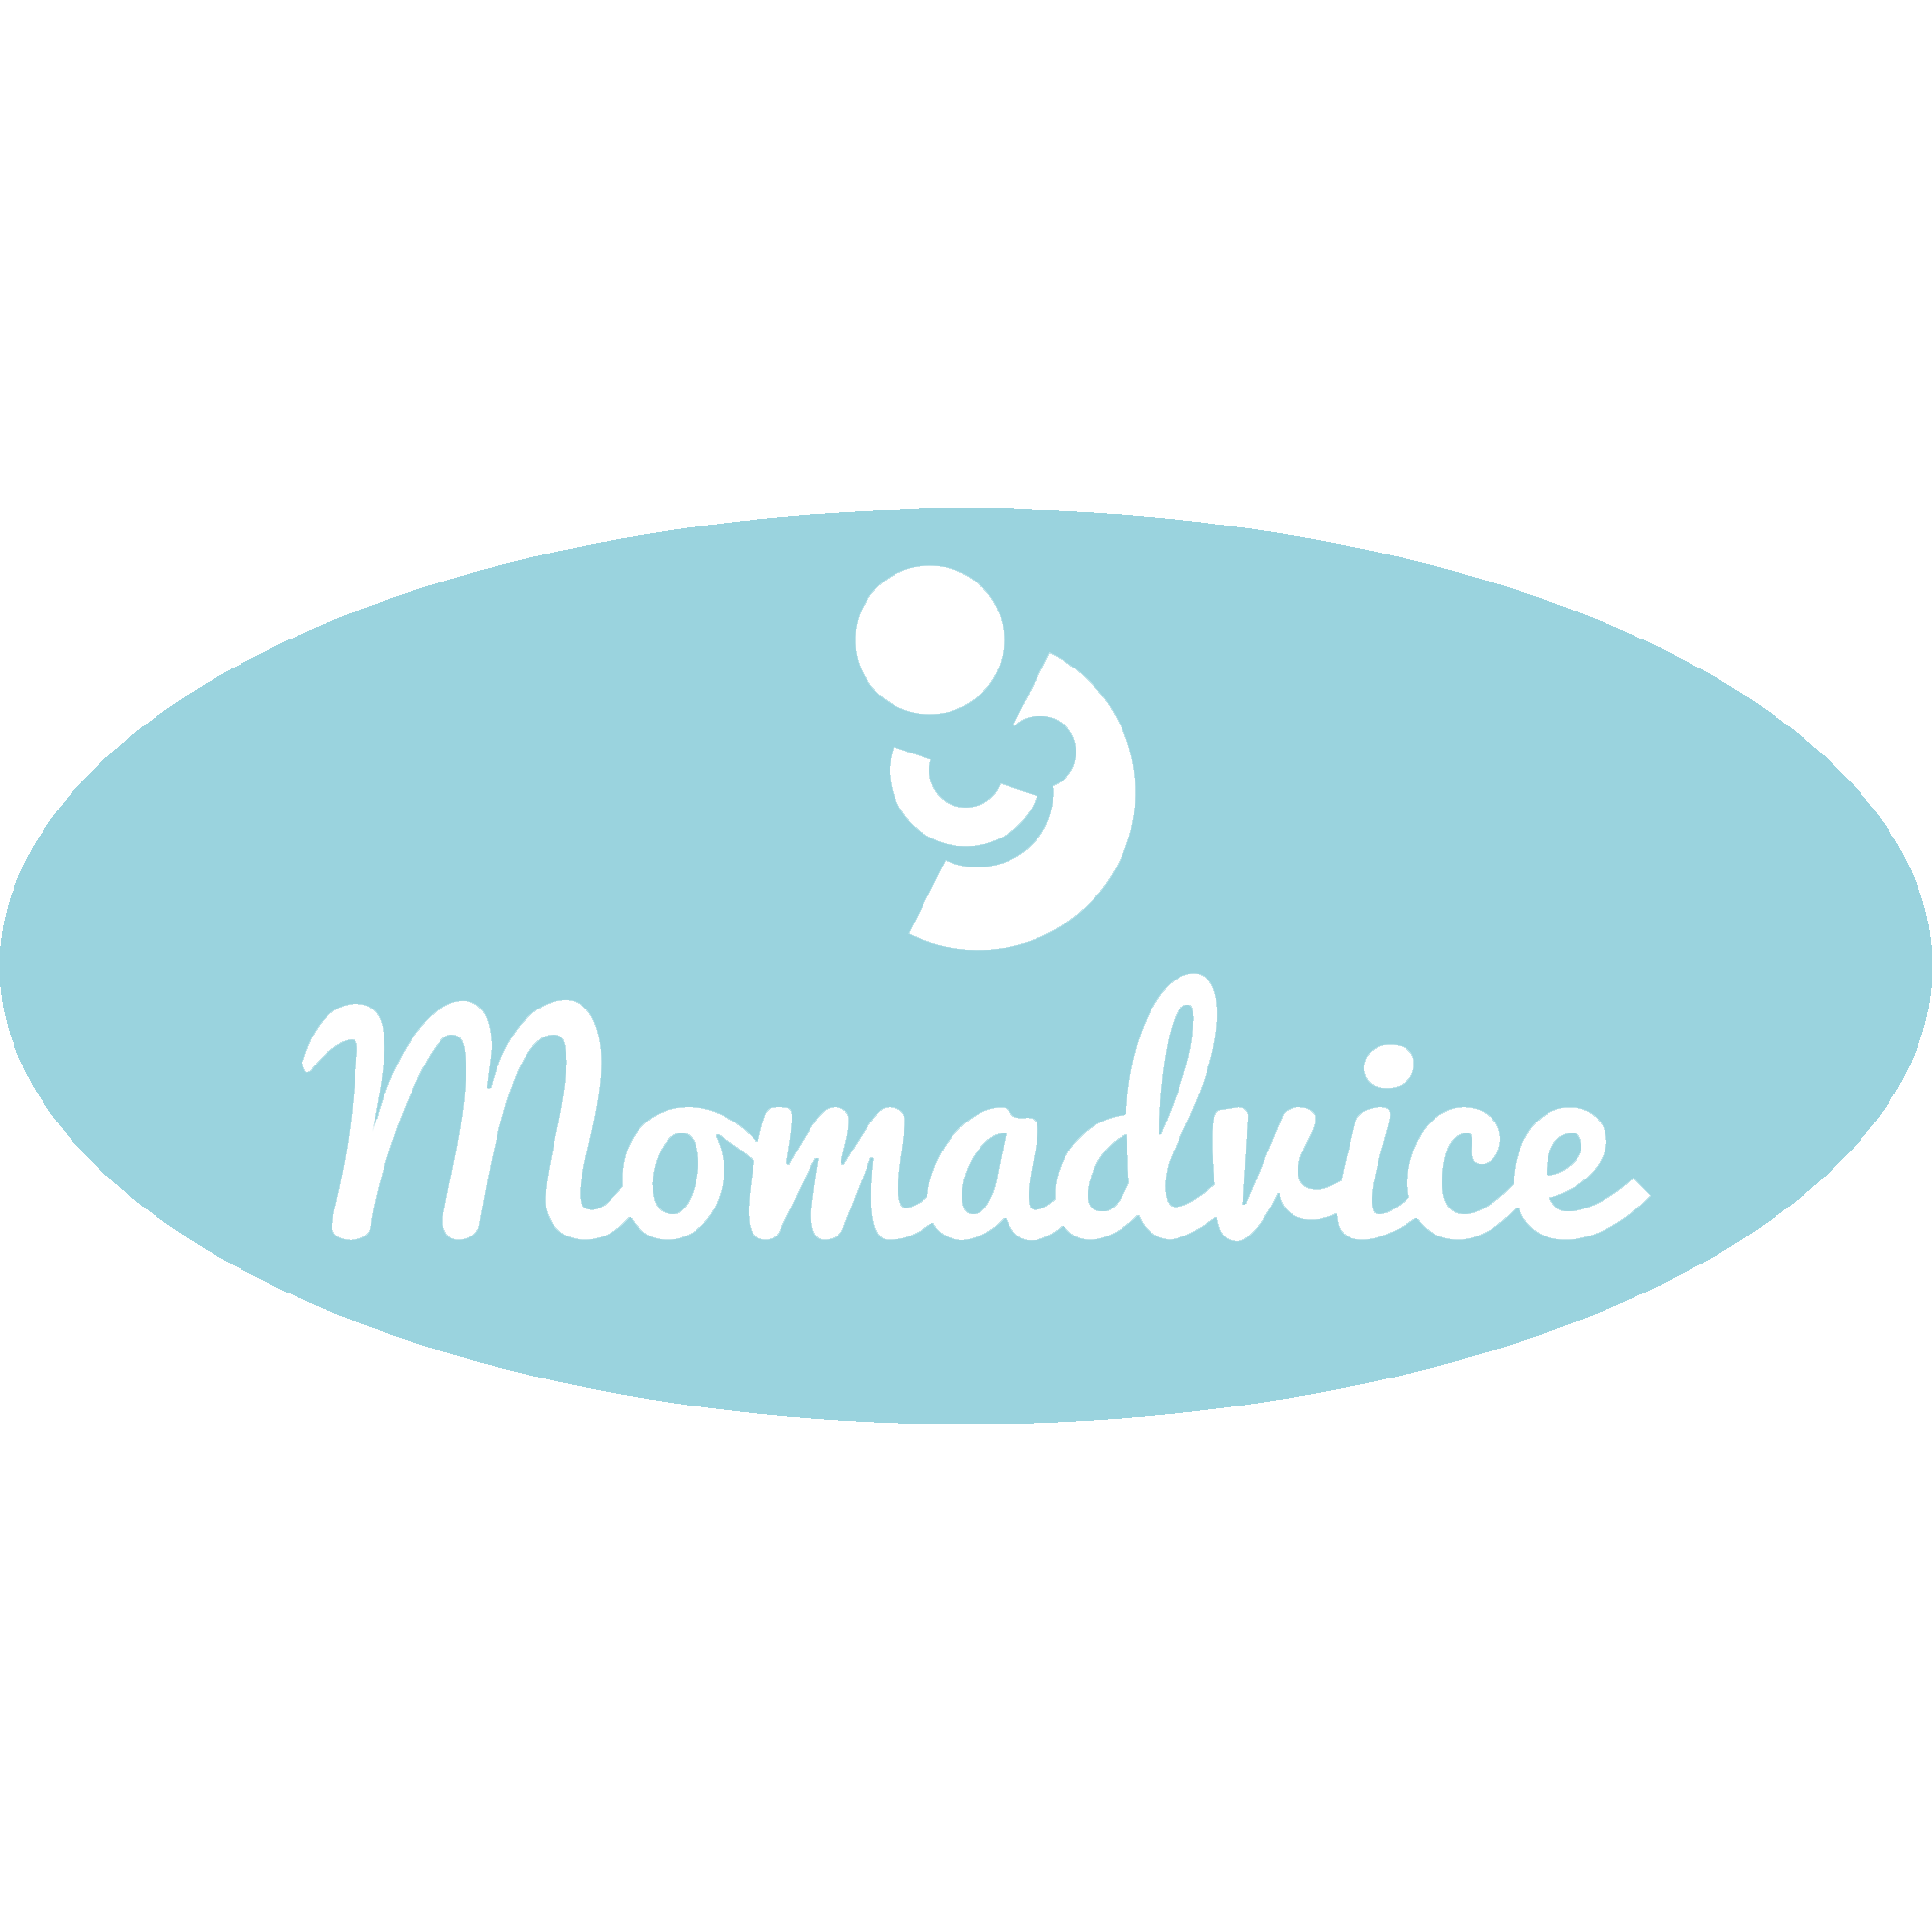 Mom advice app logo